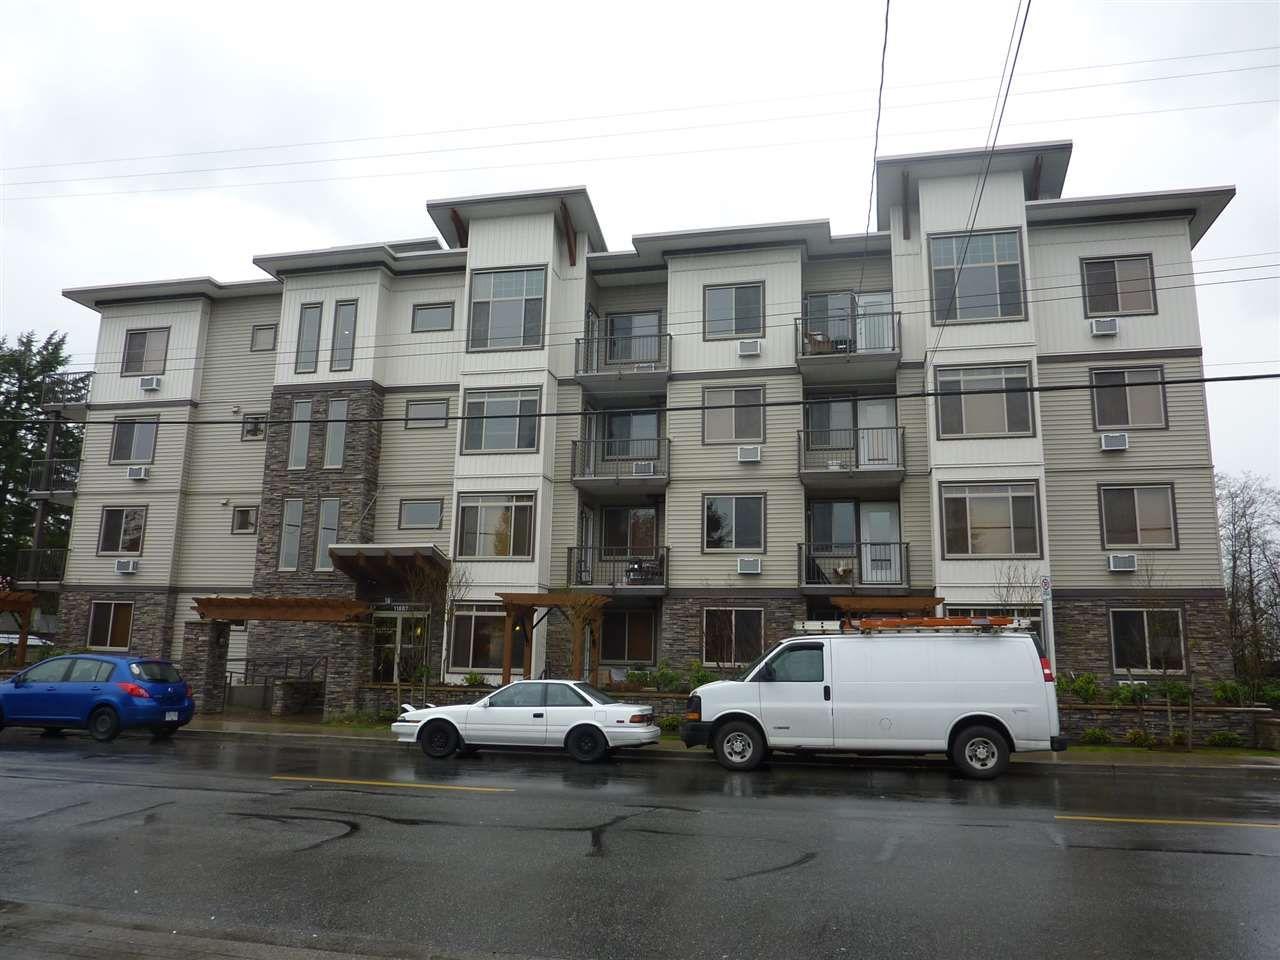 "Main Photo: 216 11887 BURNETT Street in Maple Ridge: East Central Condo for sale in ""WELLINGTON STATION"" : MLS®# R2119393"